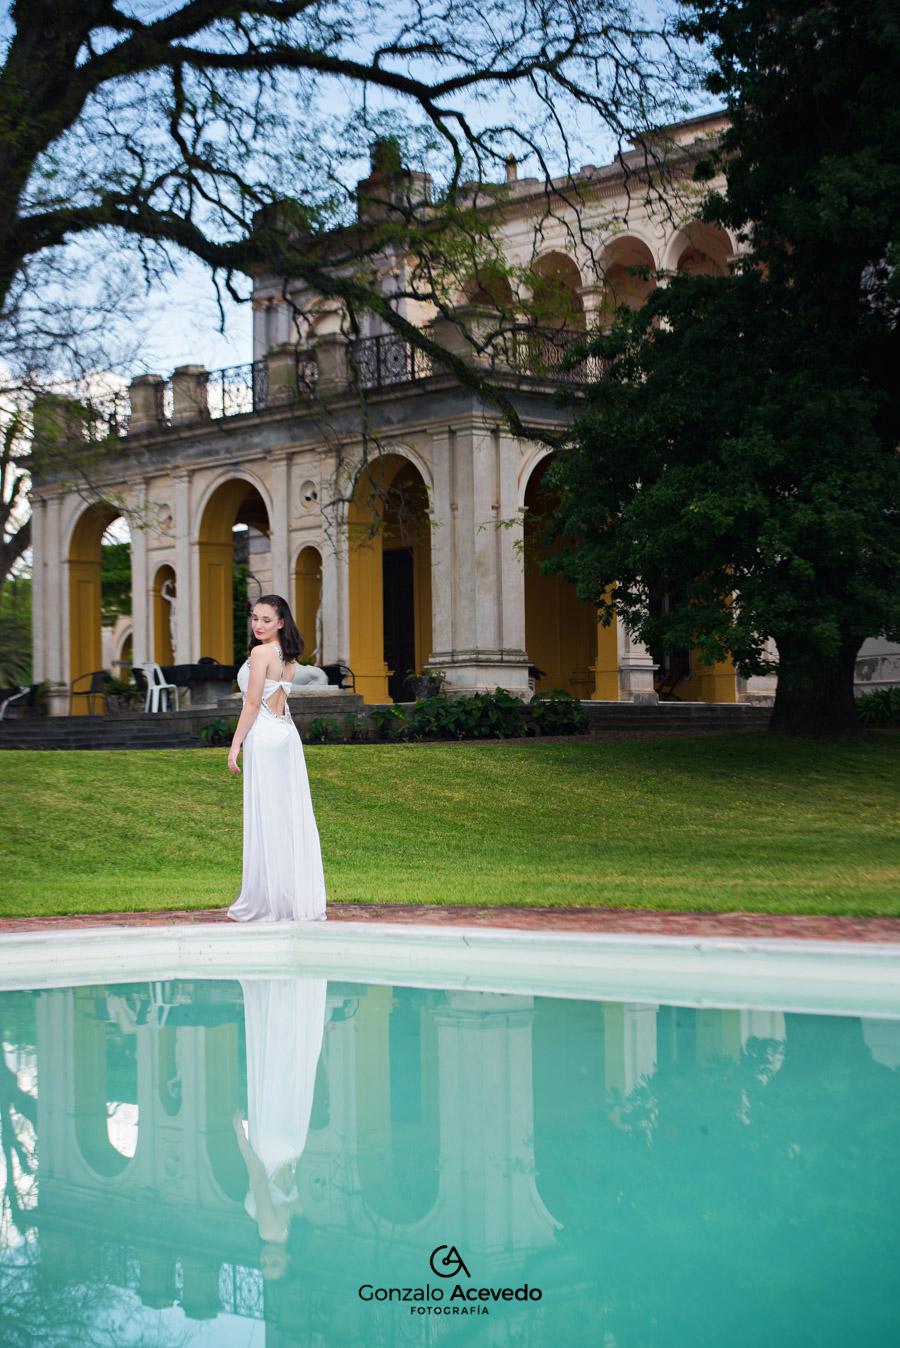 Cami book de 15 vestidos dress naturaleza verde princesa princess ideas fifteens ideas geniales originales #gonzaloacevedofotografia gonzalo acevedo